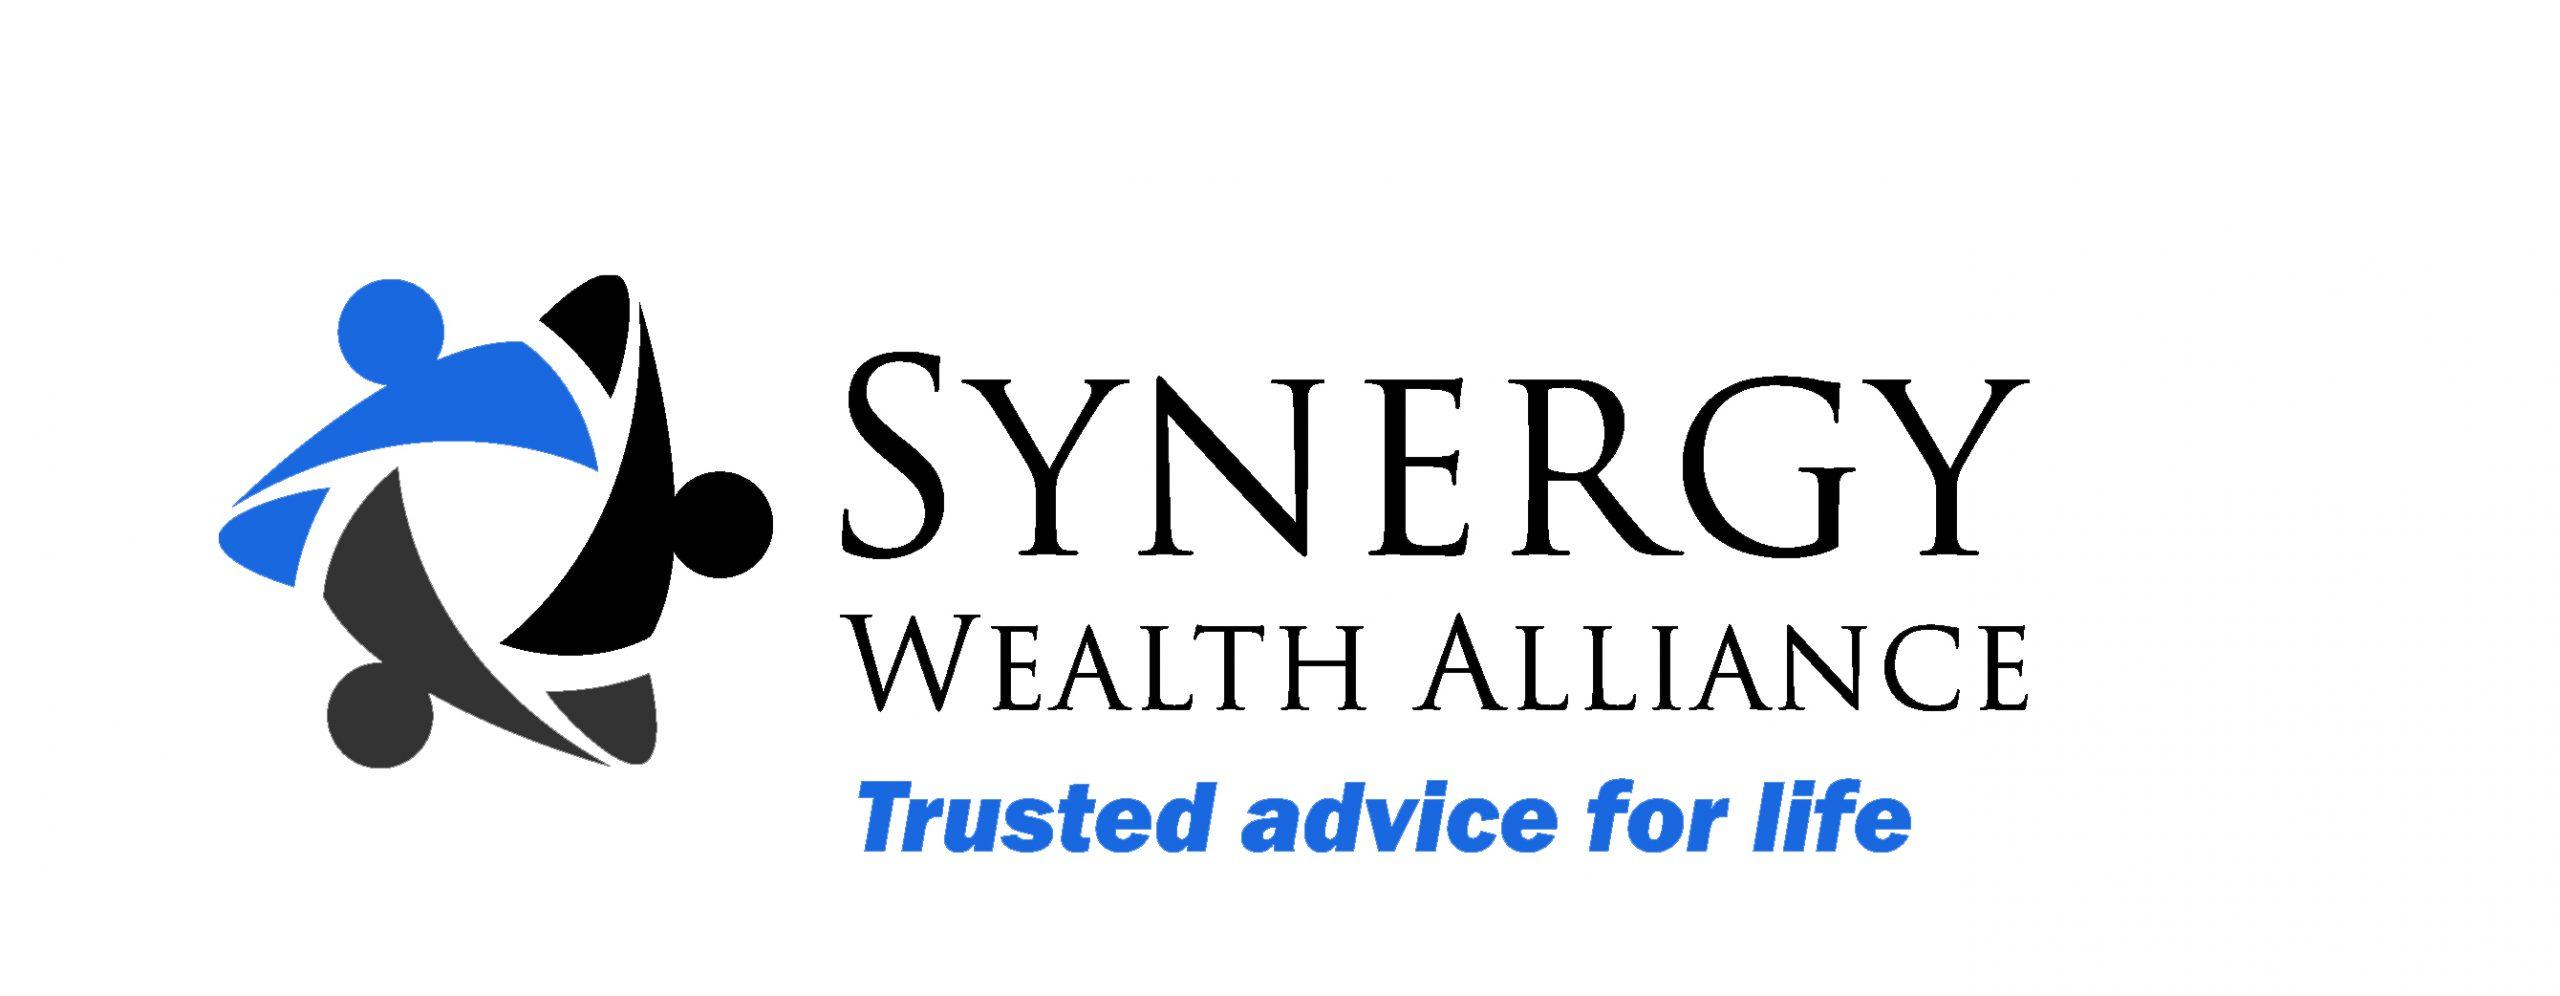 Synergy Wealth Alliance Logo